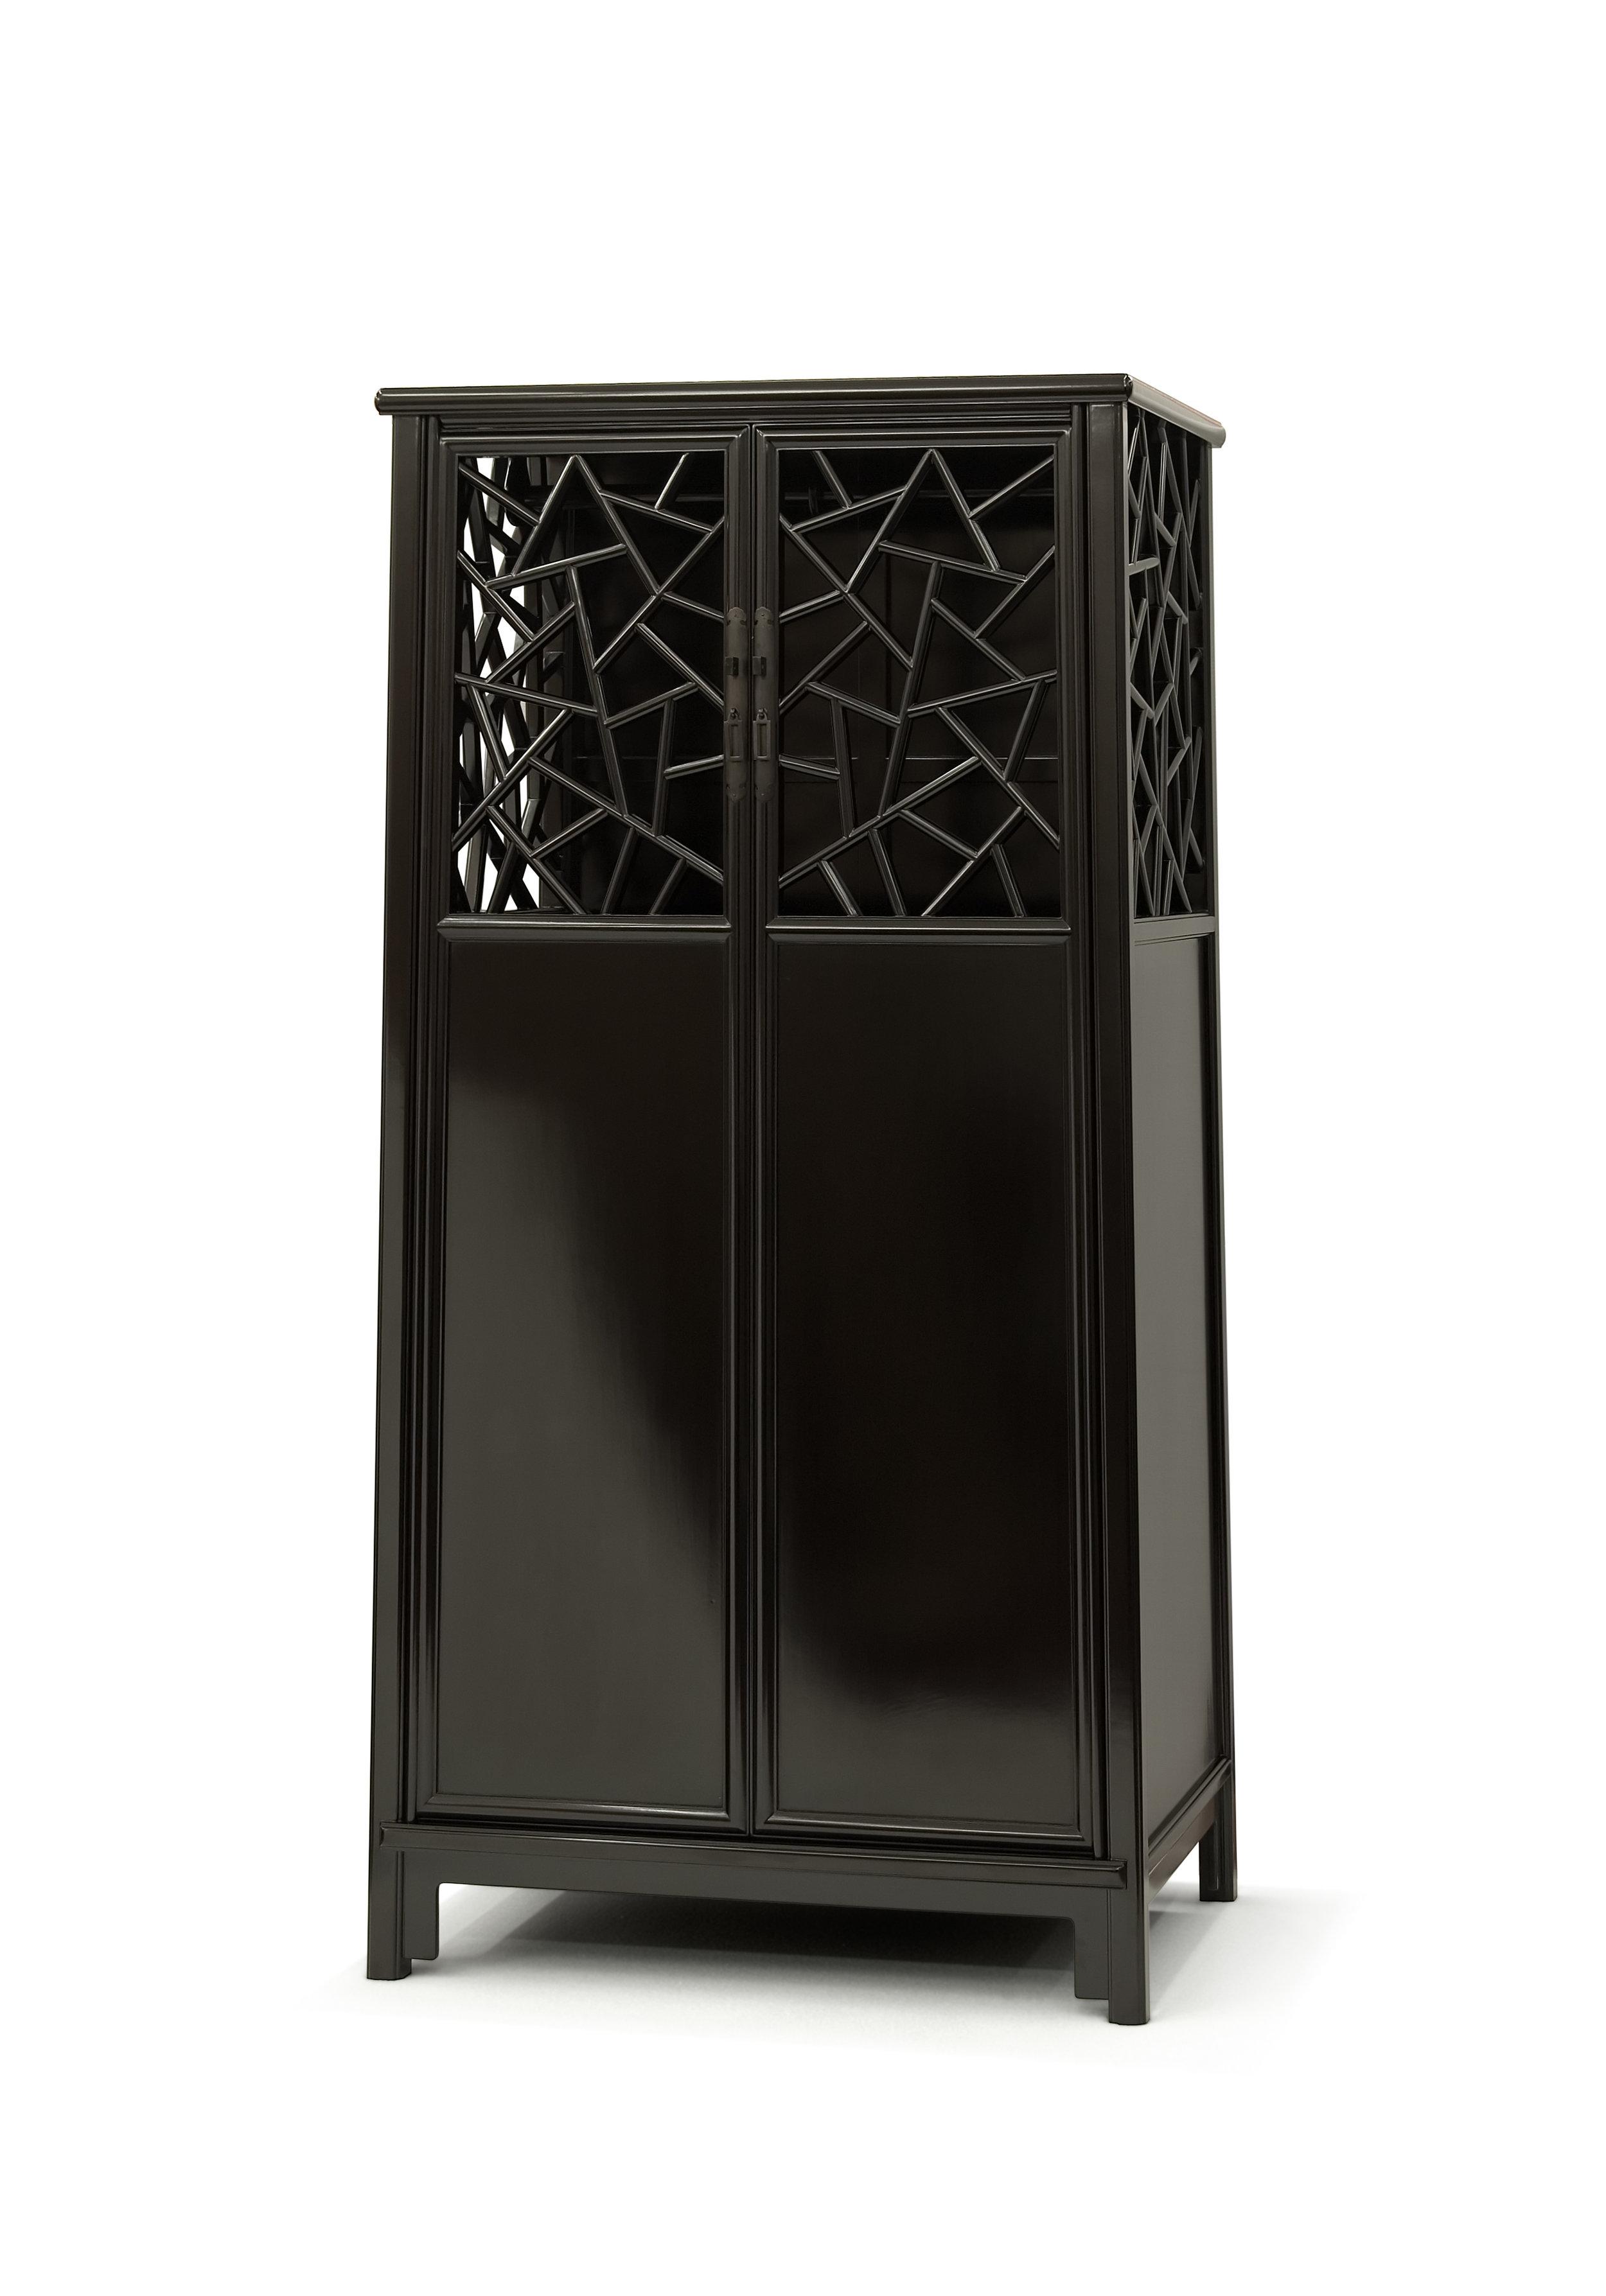 ....chinese ming style furniture | park hyatt washington : splay leg cabinet..中式明式家具 | 华盛顿柏悦酒店 :面条柜....